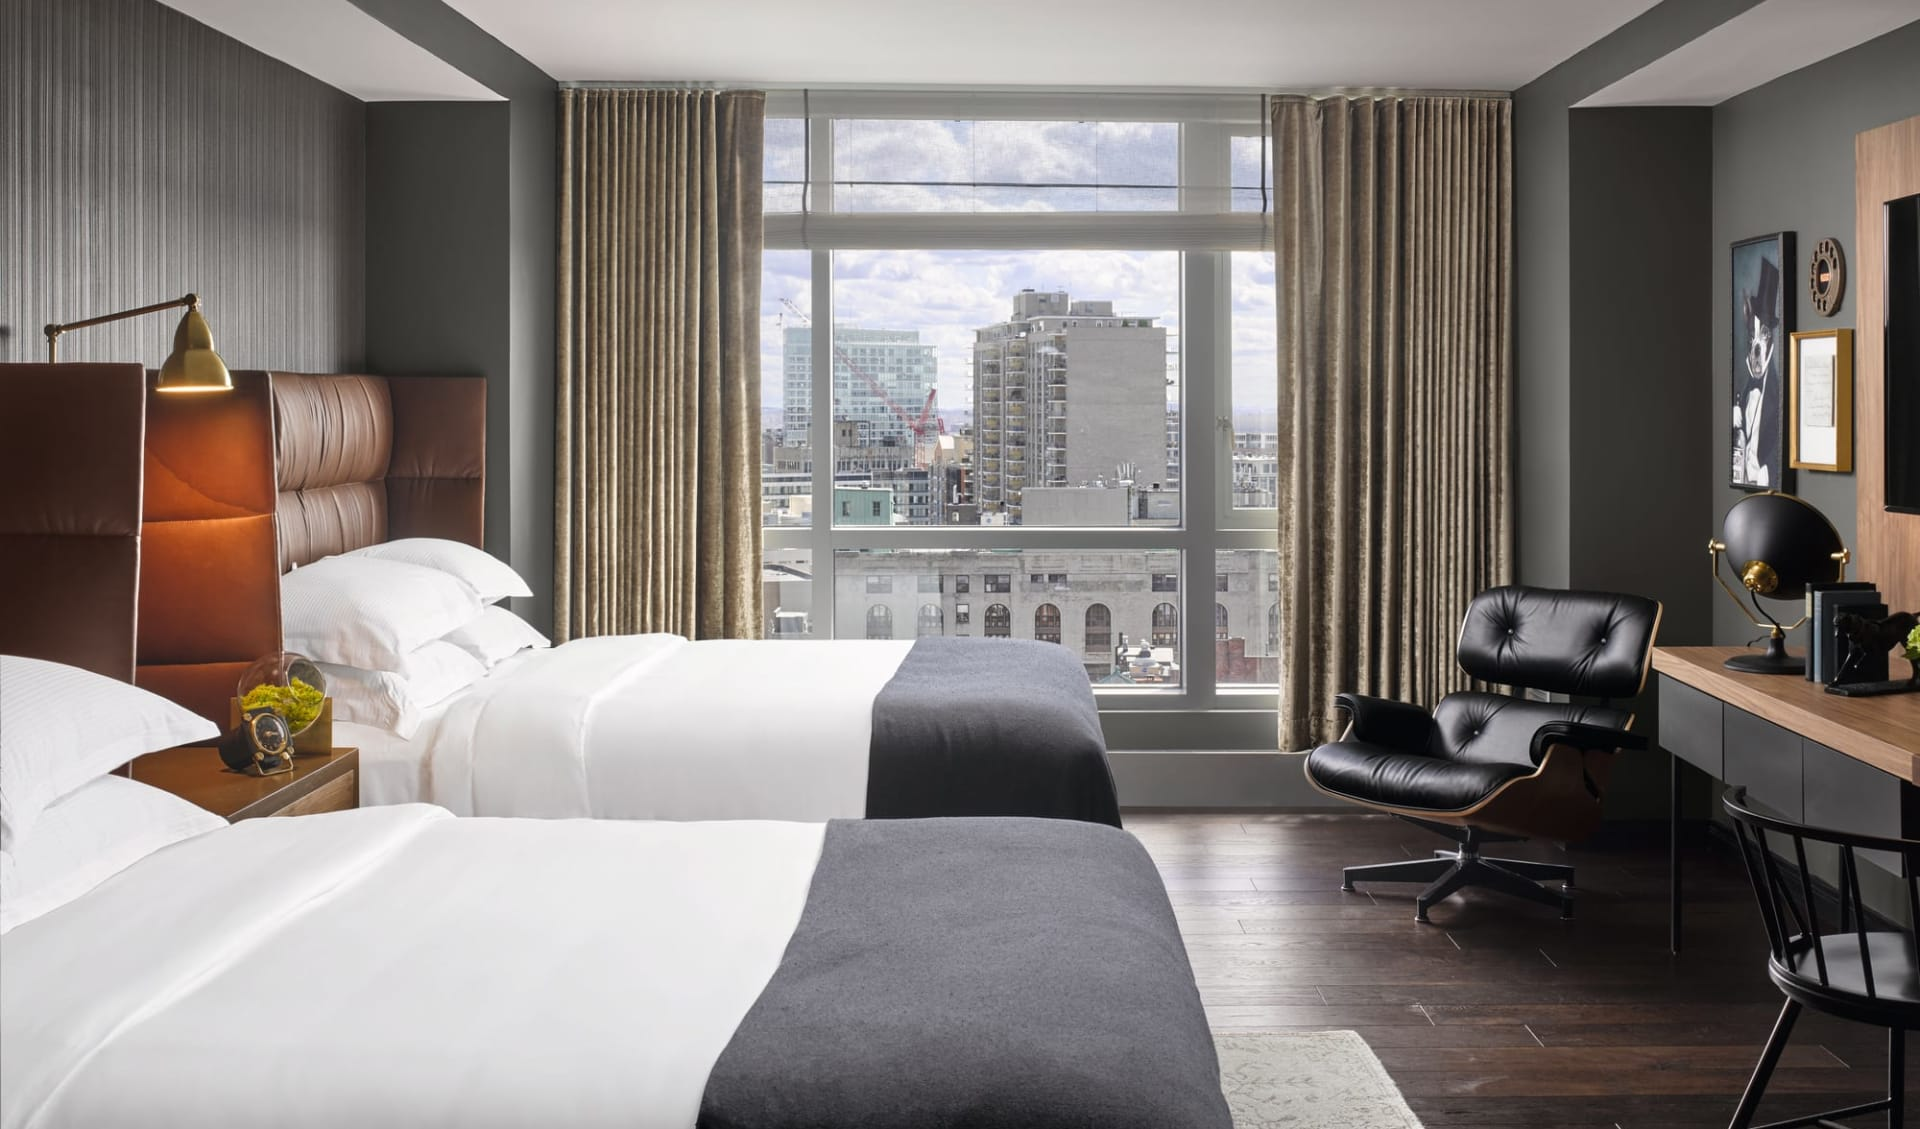 Nine Zero Hotel, a Kimpton Hotel in Boston:  Nine Zero Hotel - Deluxe Room